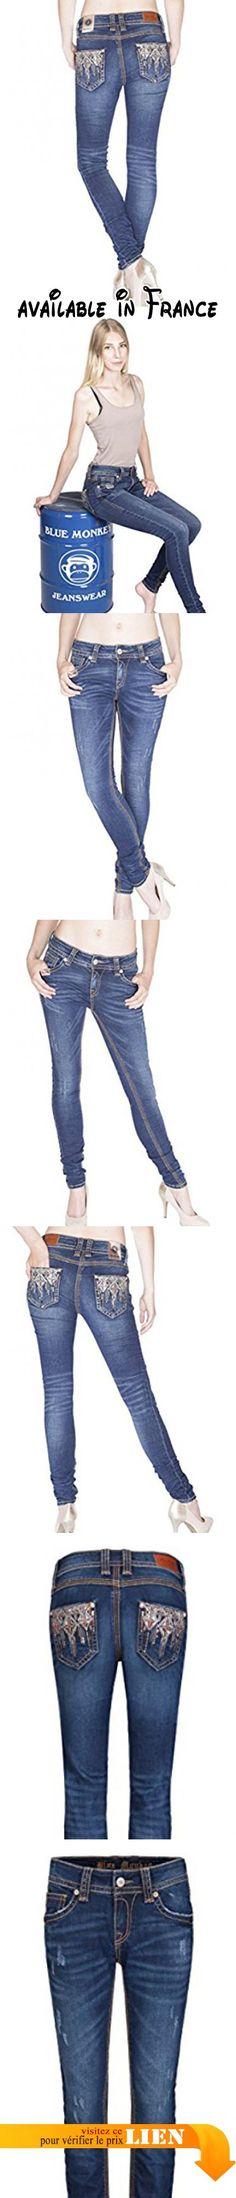 B06XC3DHBB : Blue Monkey Jeans - Jeans - Skinny - Uni - Femme - bleu - W25.